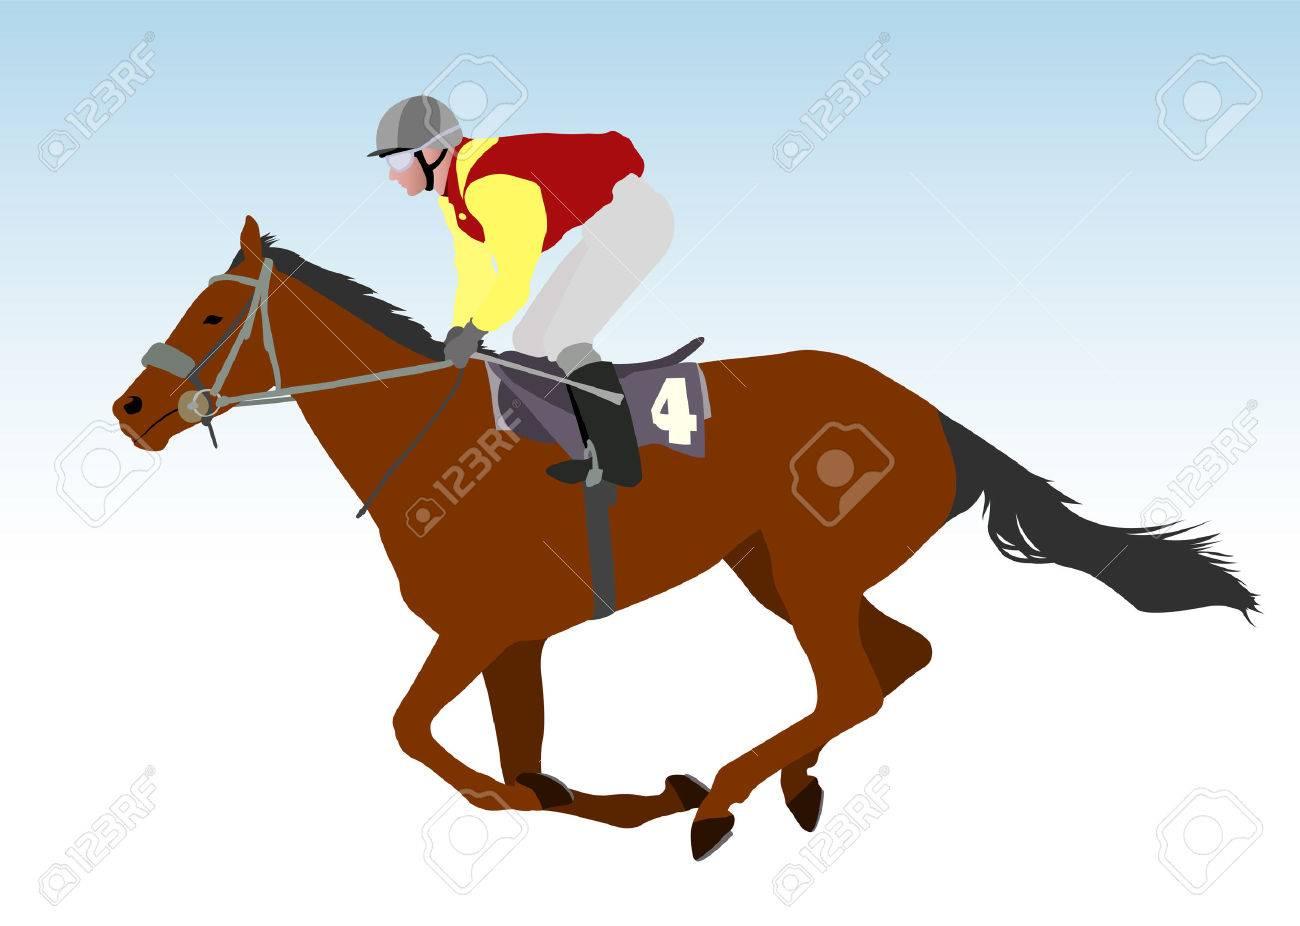 jockey riding race horse illustration - 31598941